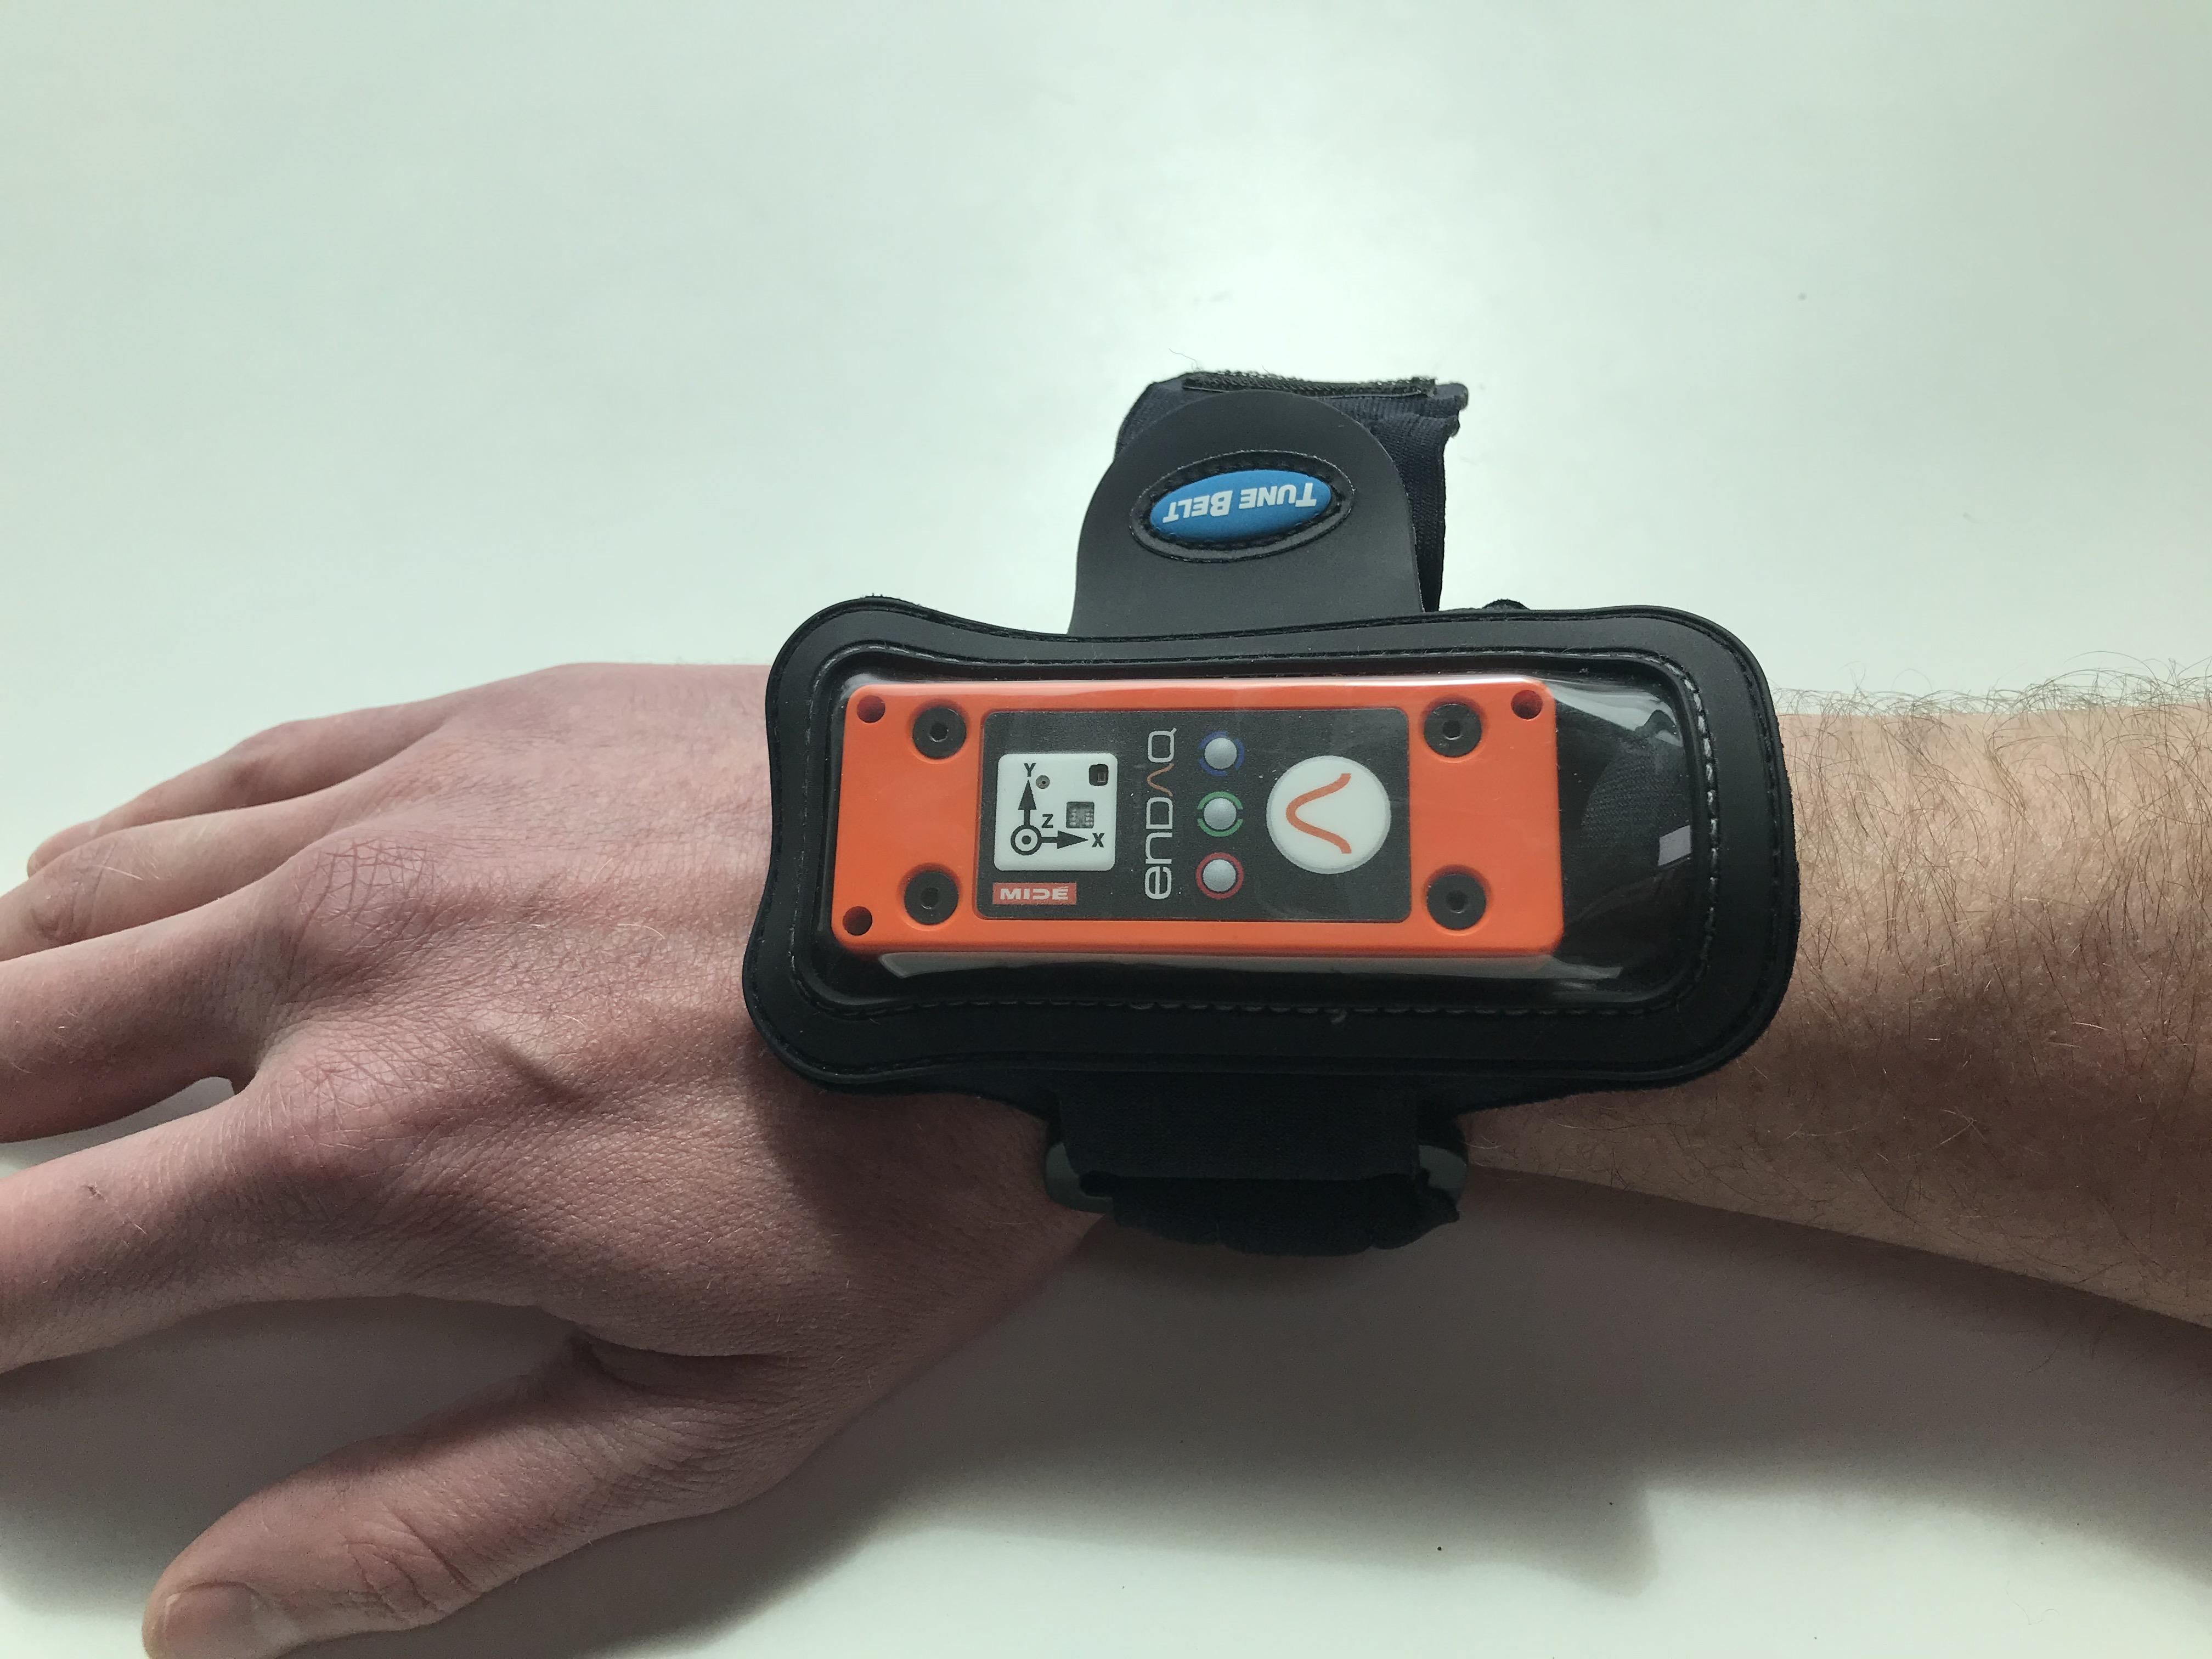 enDAQ Sensor Location on Wrist